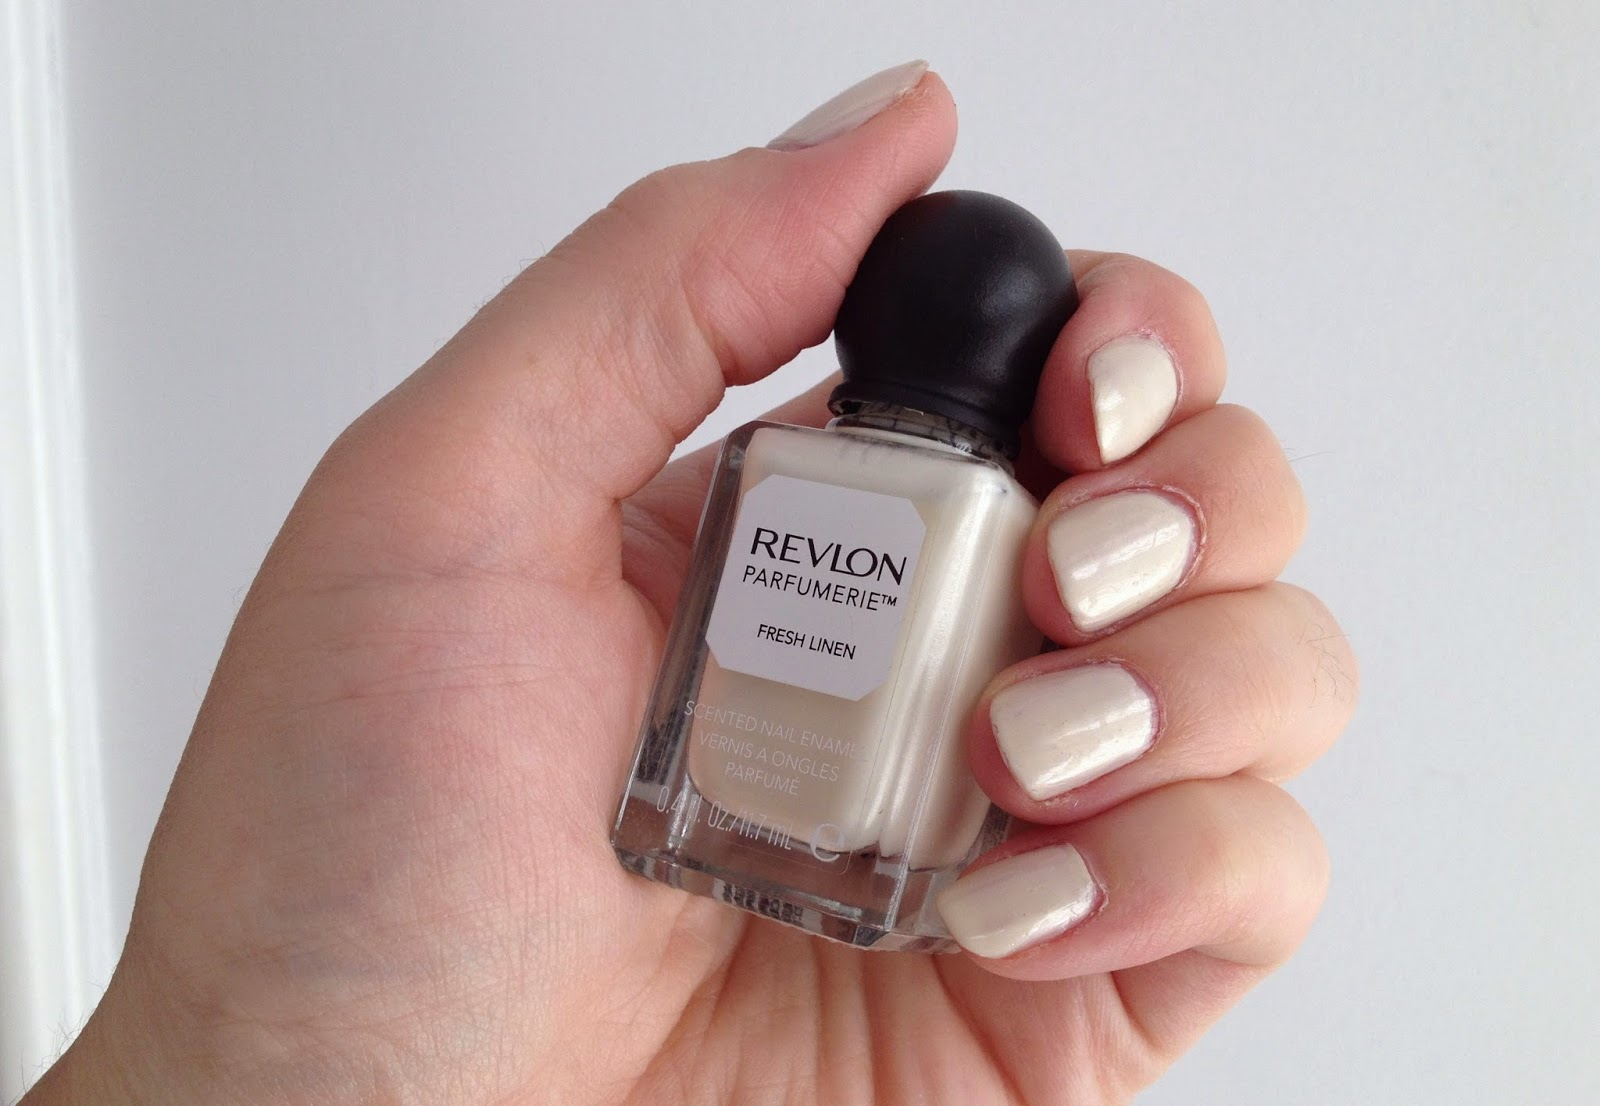 Revlon Parfumerie scented nail polish Fresh Linen